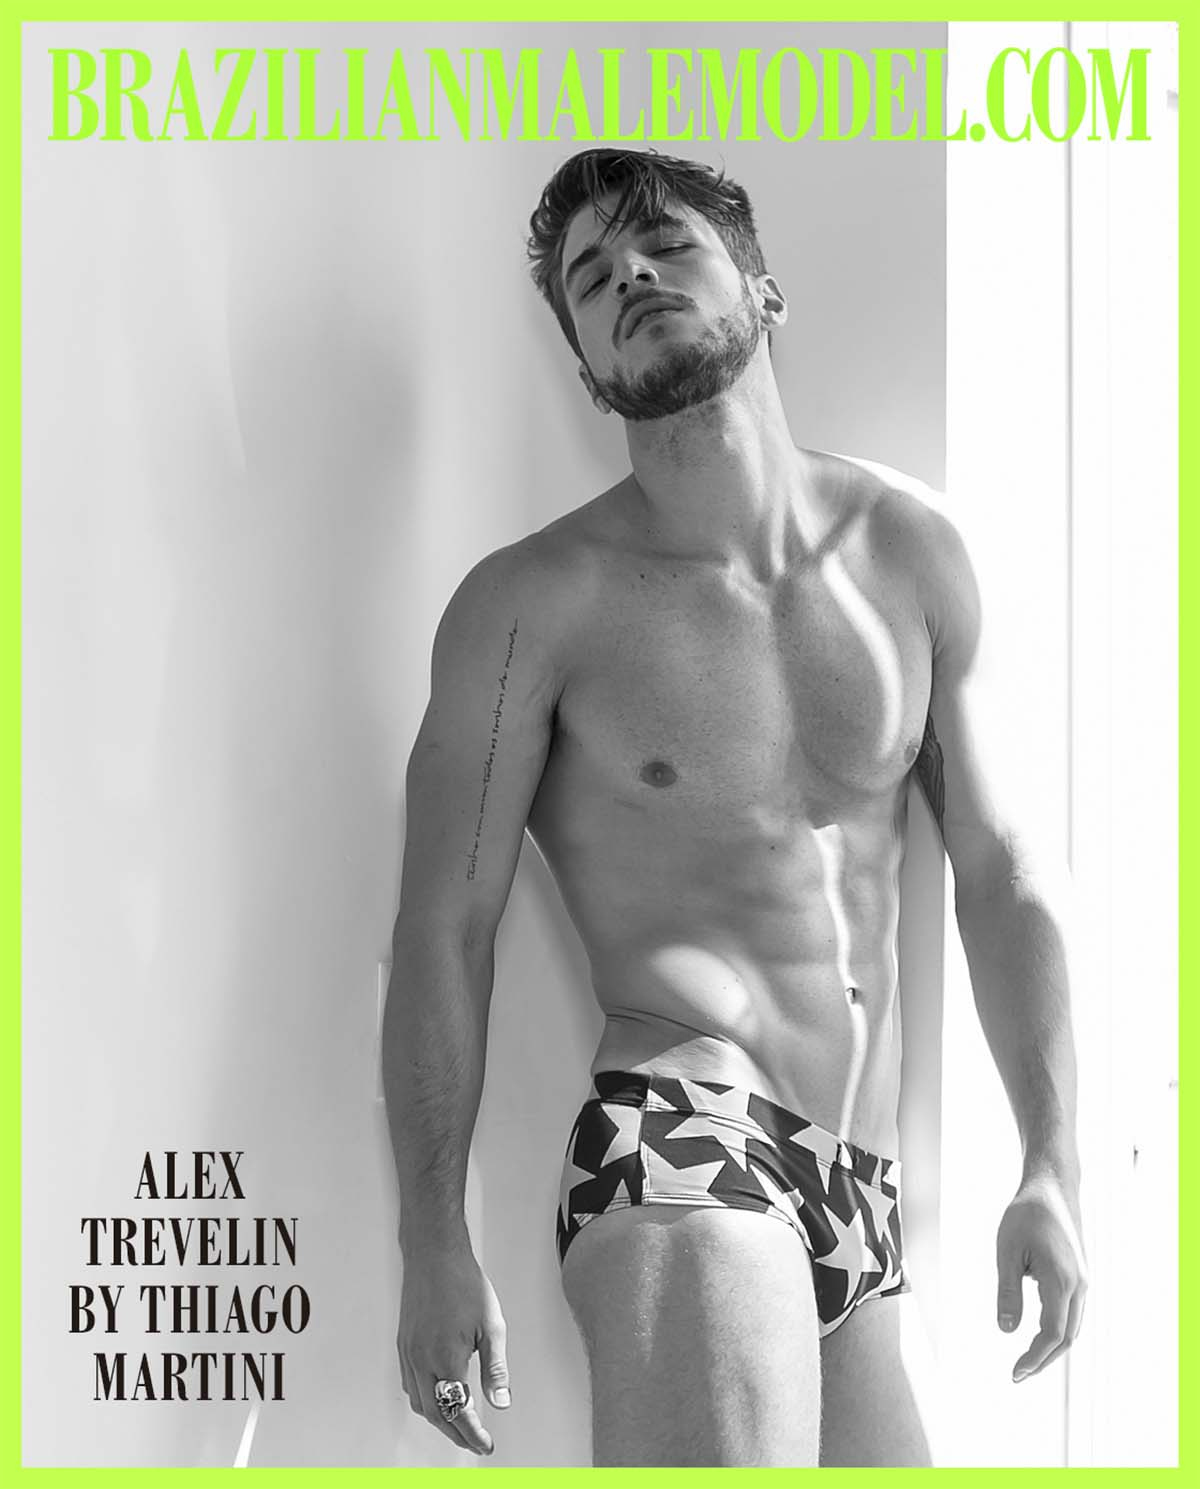 Alex Trevelin by Thiago Martini X YUP MAGAZINE